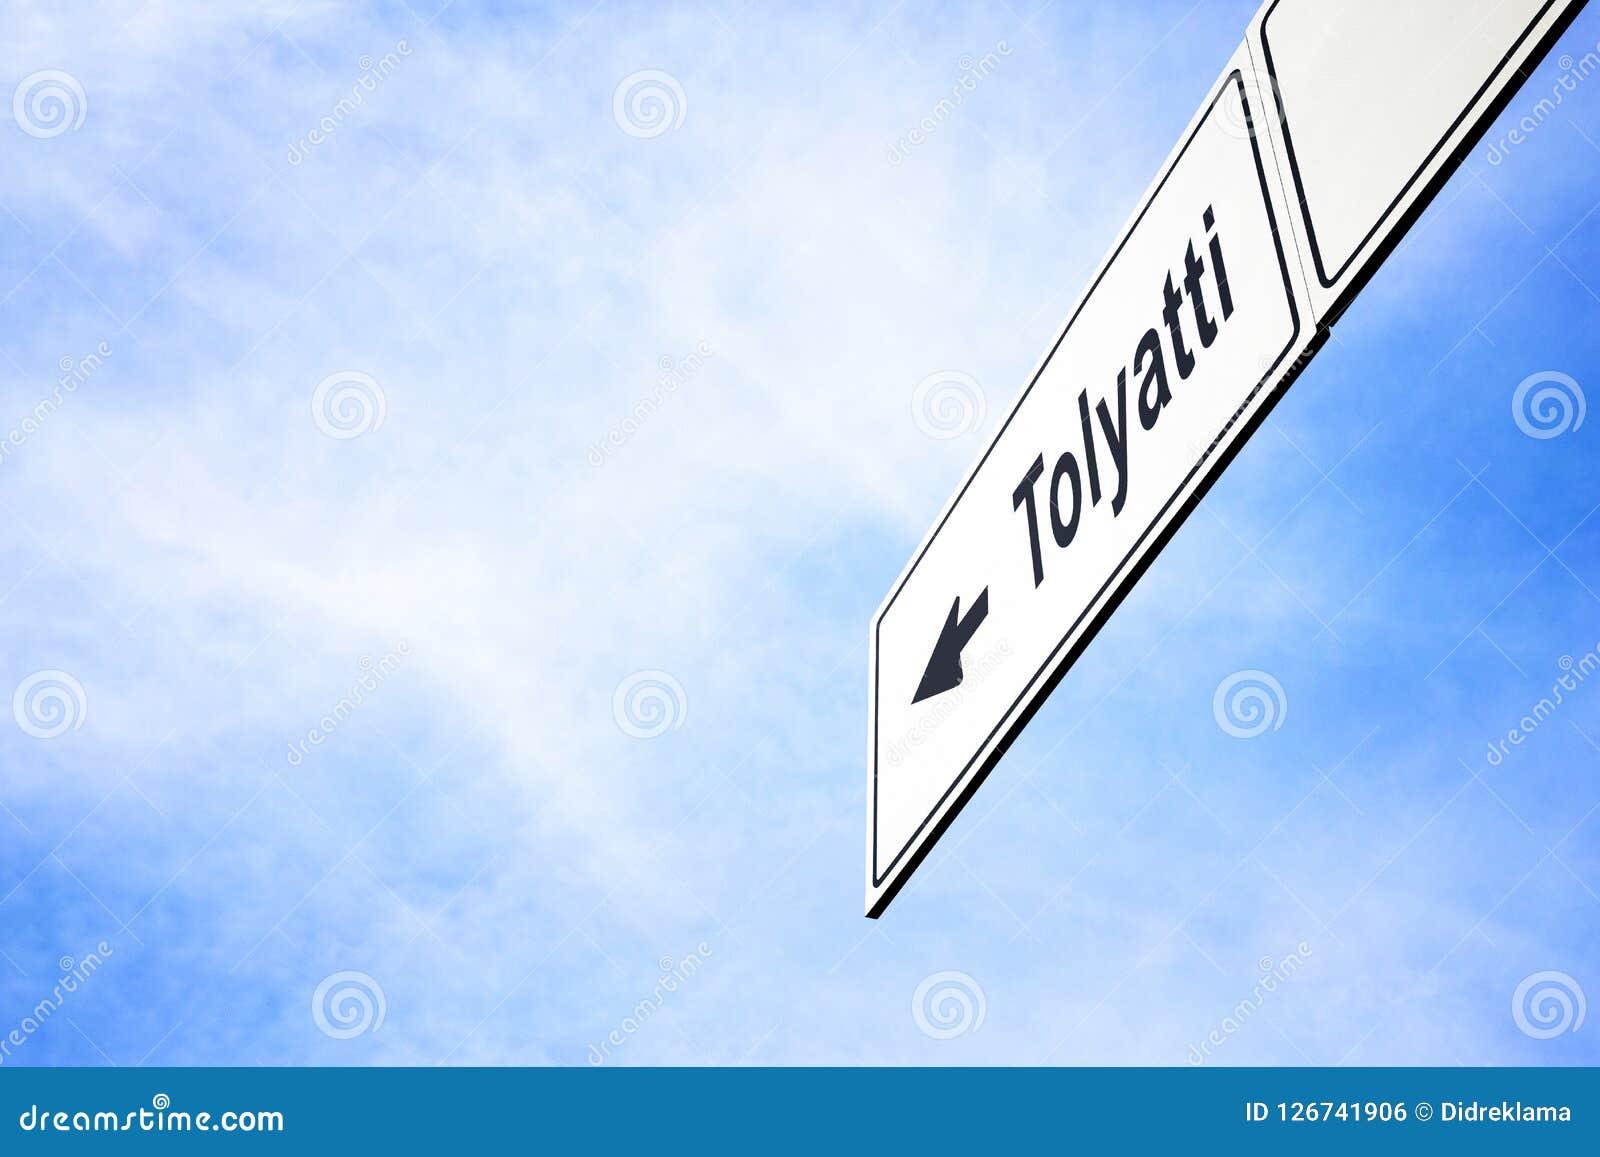 Signboard pointing towards Tolyatti